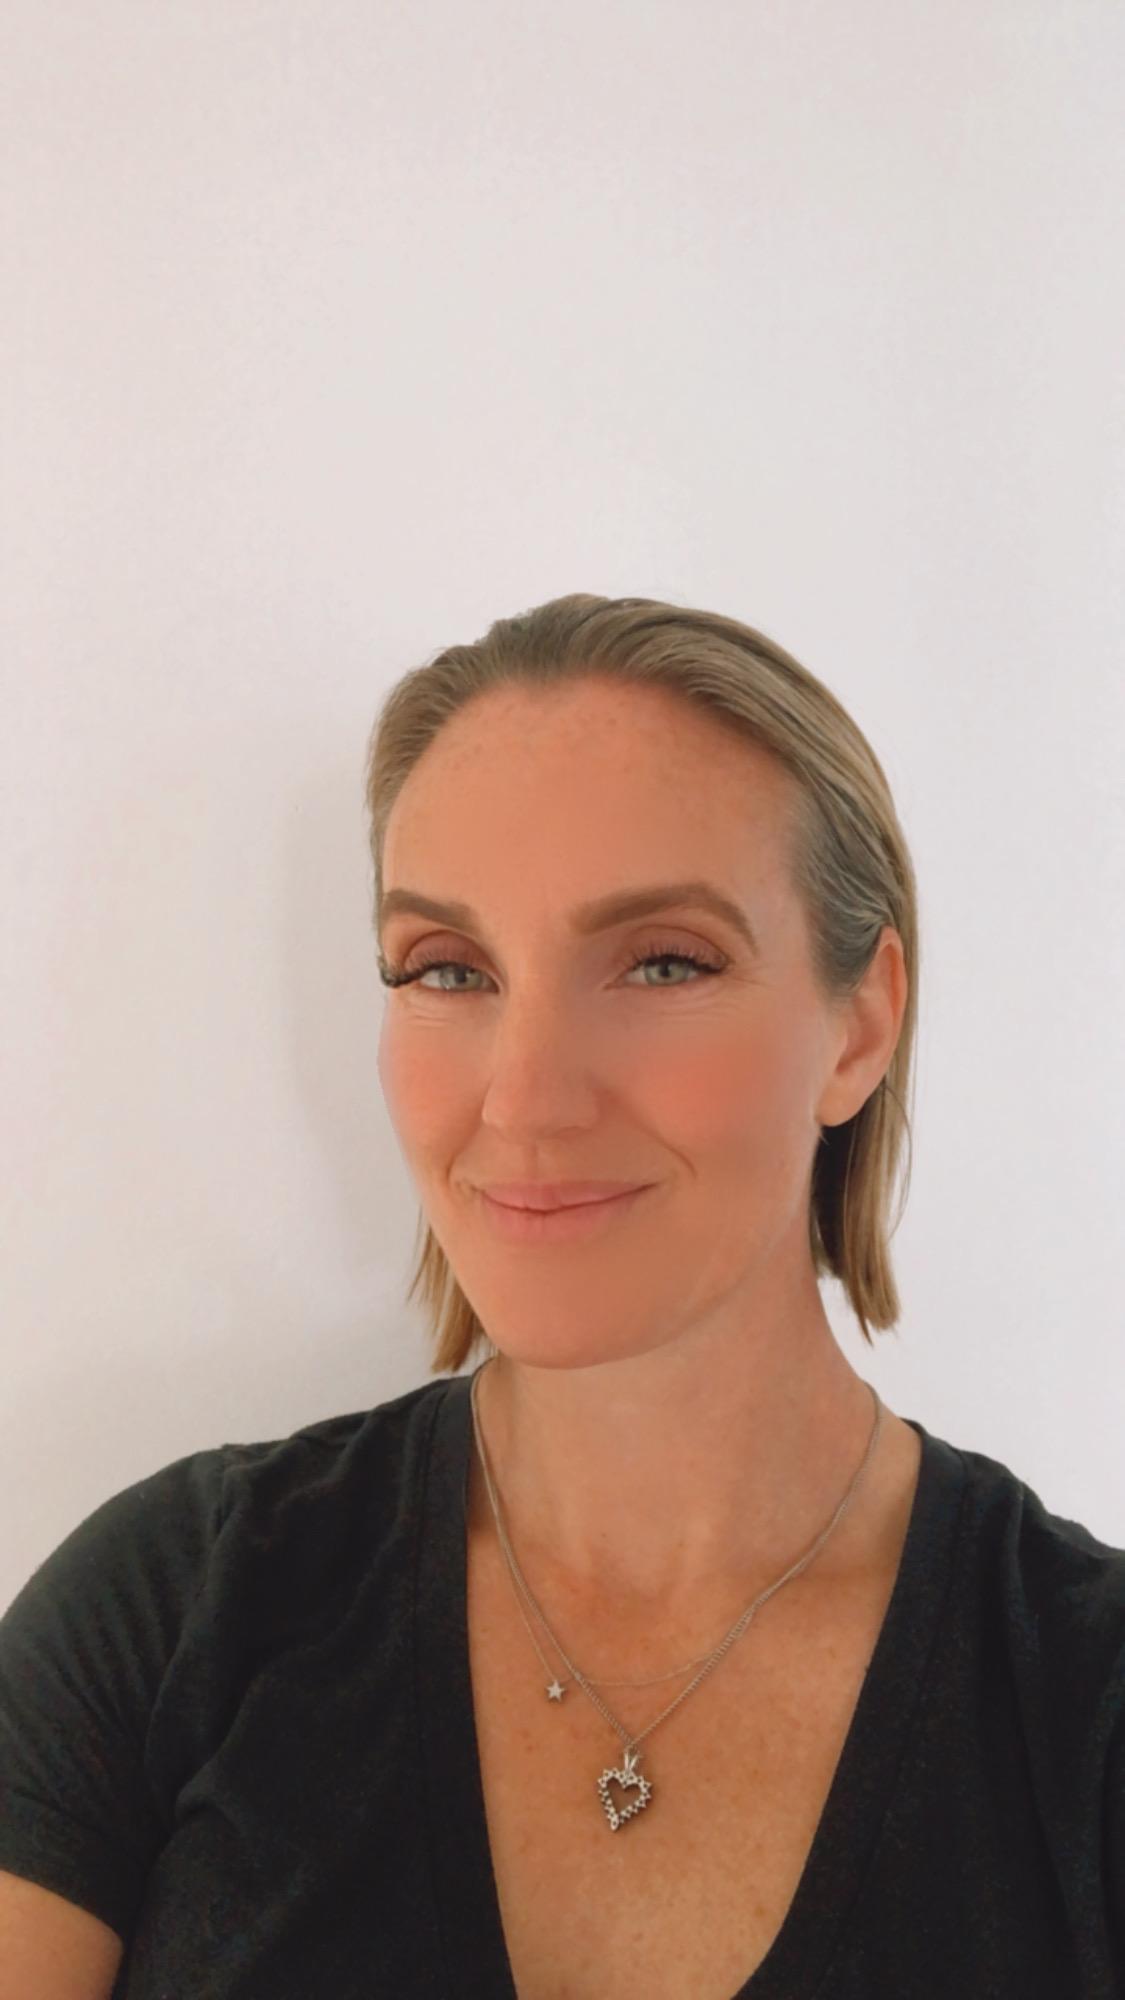 Laura Sereno